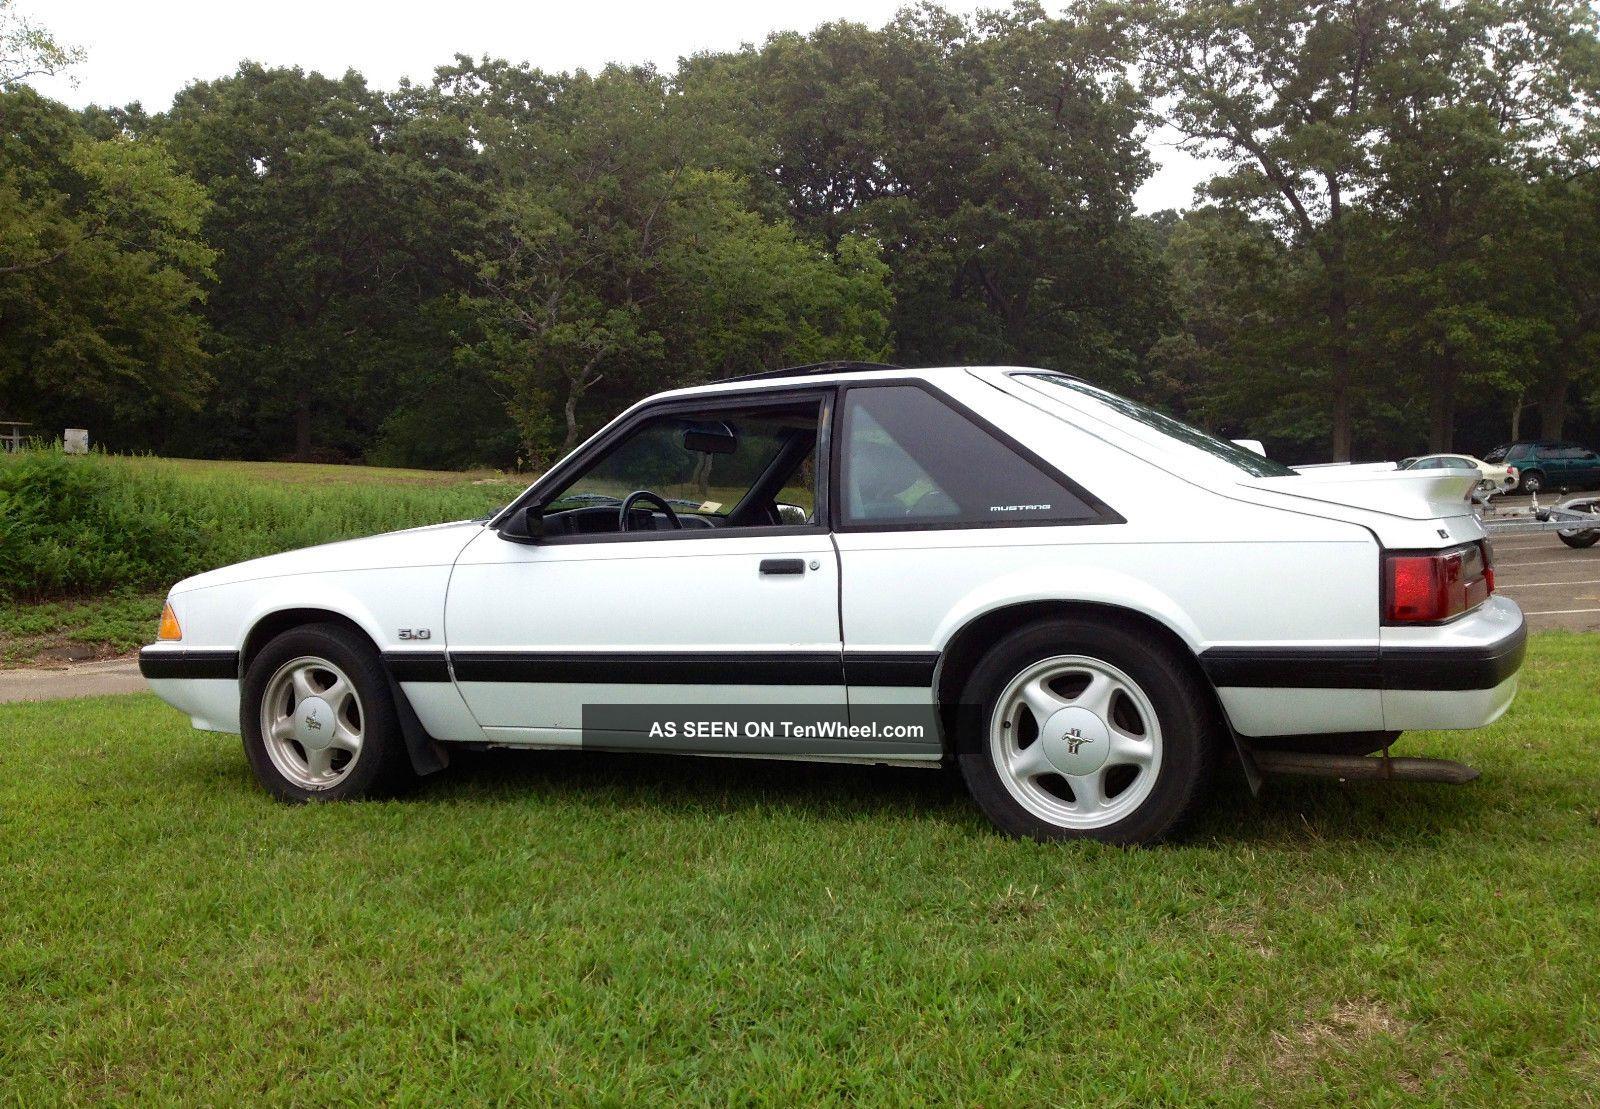 1989 ford mustang lx hatchback 2 door 5 0l automatic. Black Bedroom Furniture Sets. Home Design Ideas